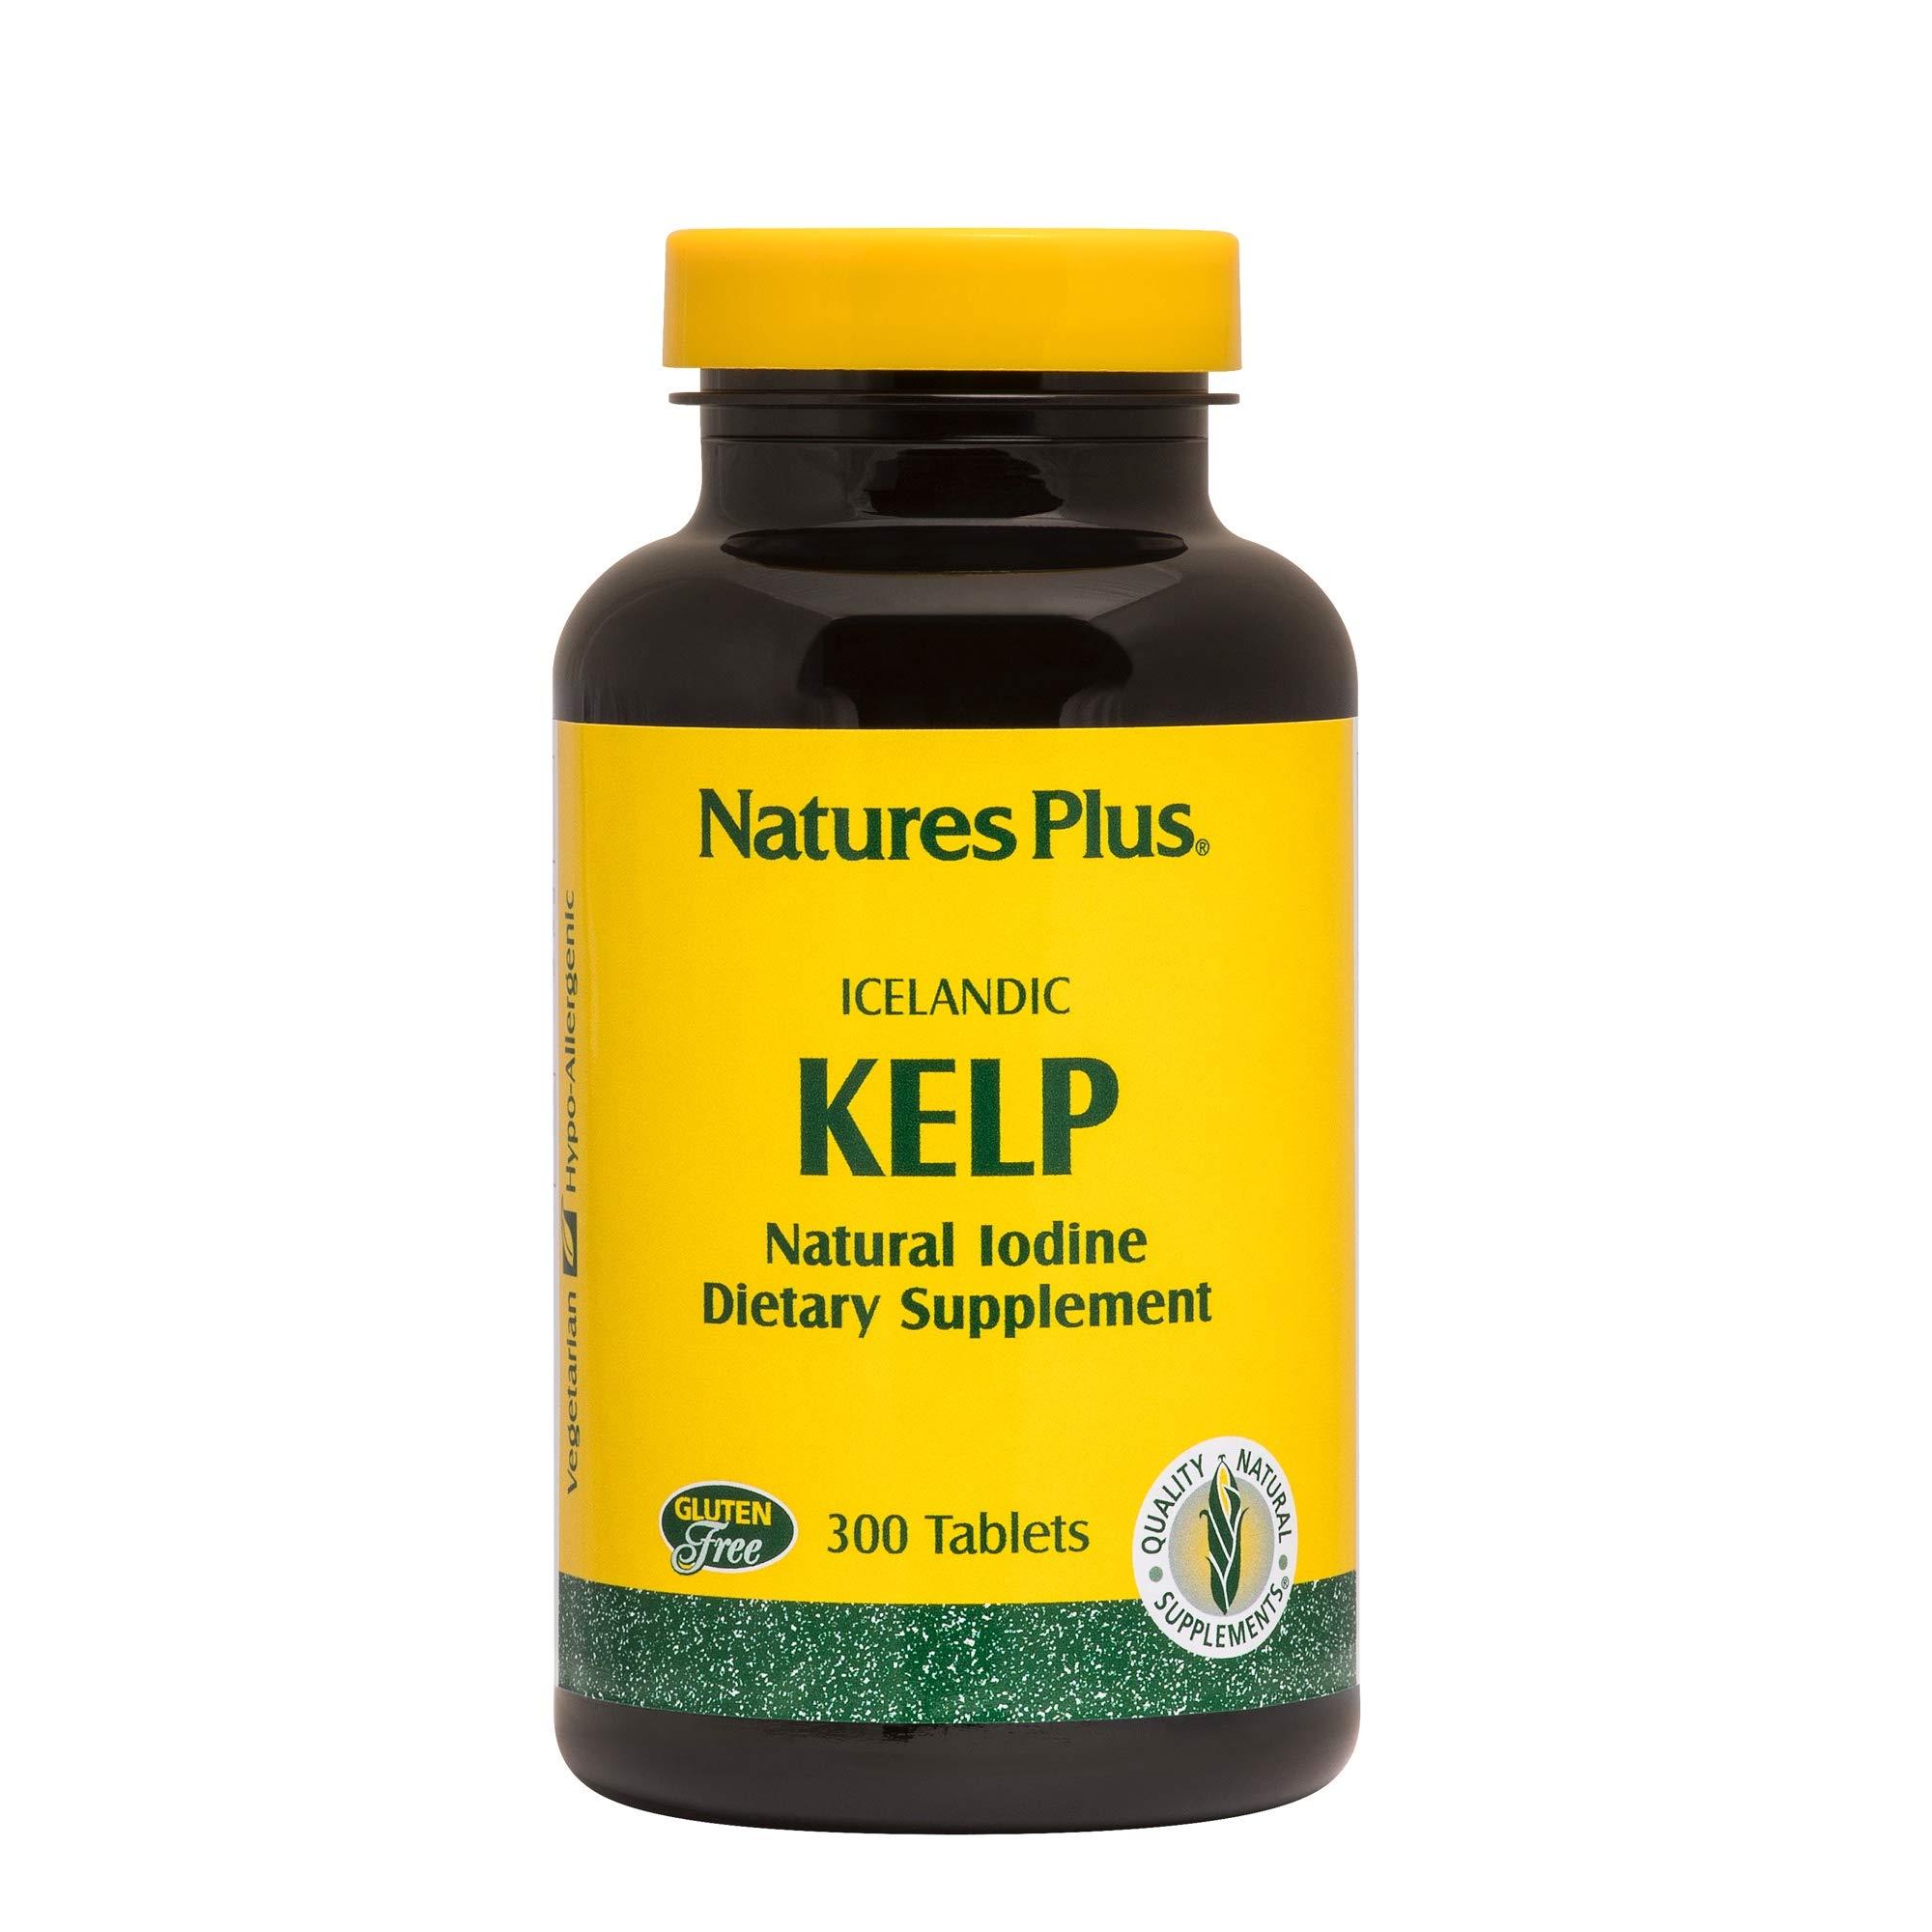 NaturesPlus IcelAndic Kelp - 150 mcg Iodine; 150 mg Kelp- 300 Vegetarian Tablets - Natural Iodine Supplement - Gluten-Free - 300 Servings